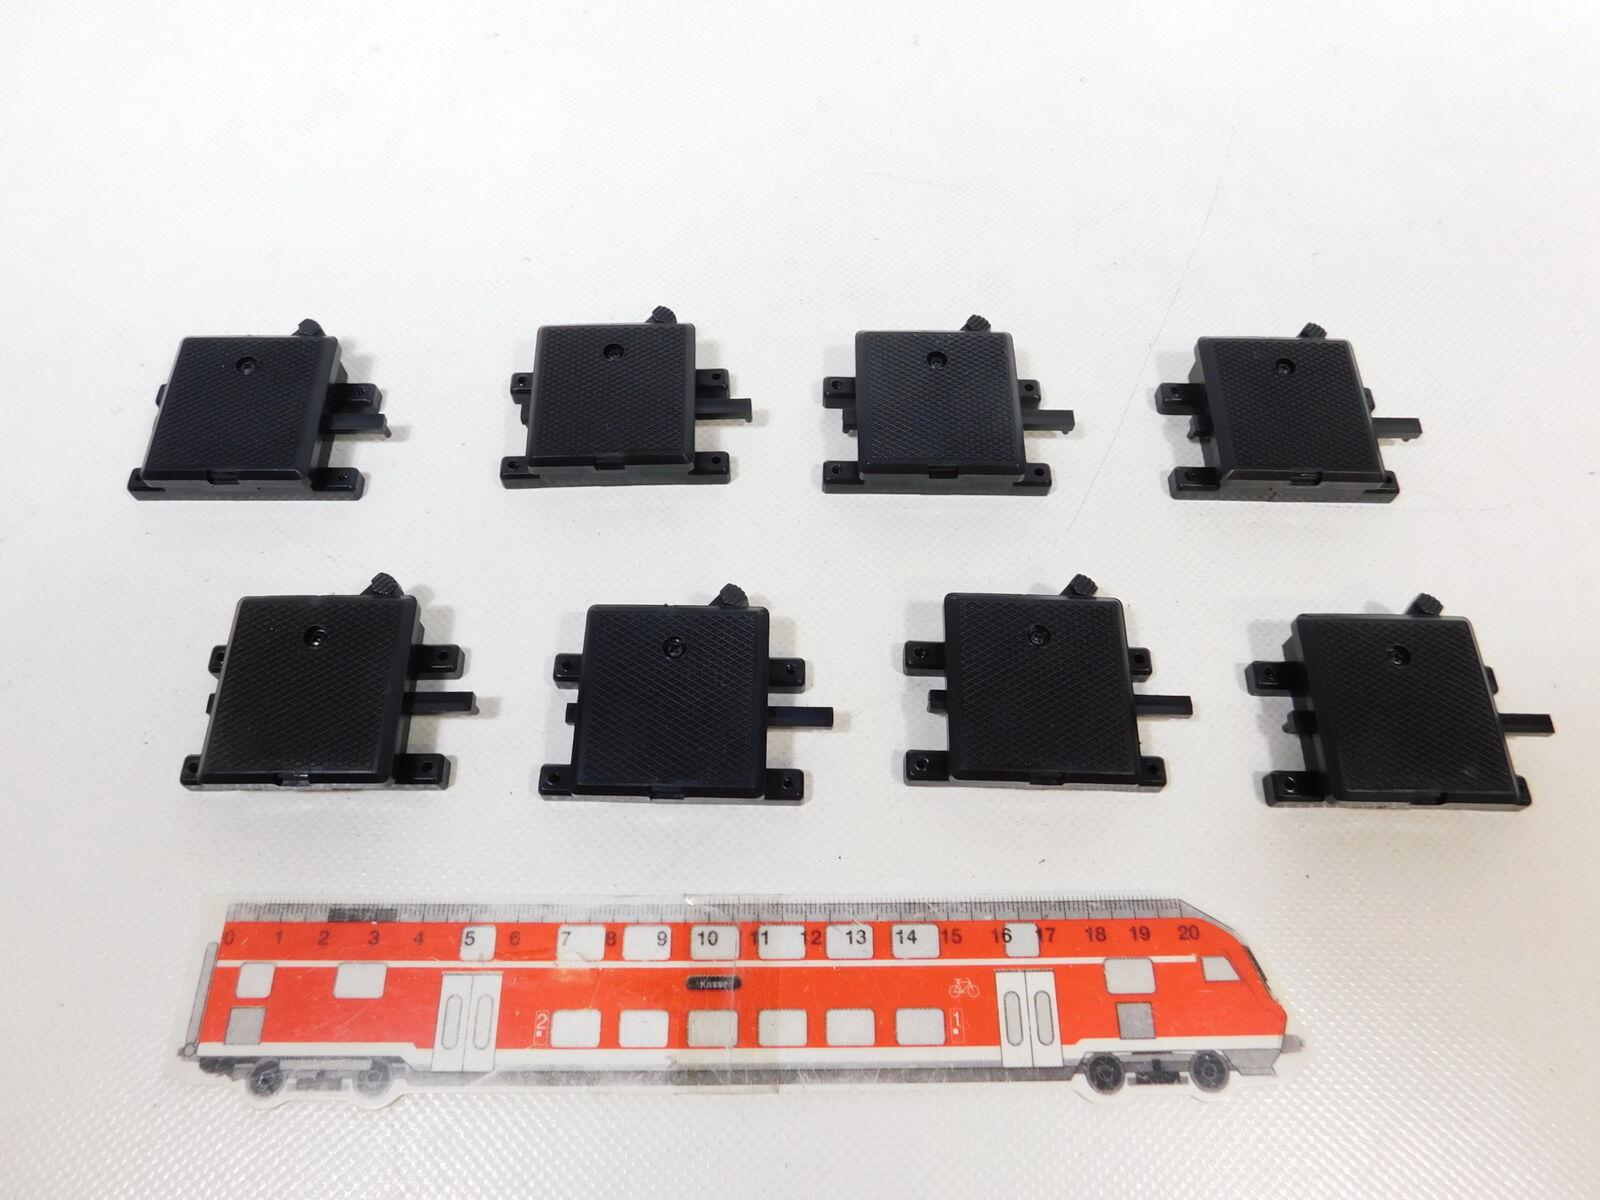 CA731-0,5 x LGB Lehmann Large Railway G Scale   Iim Hand Lever for Manual